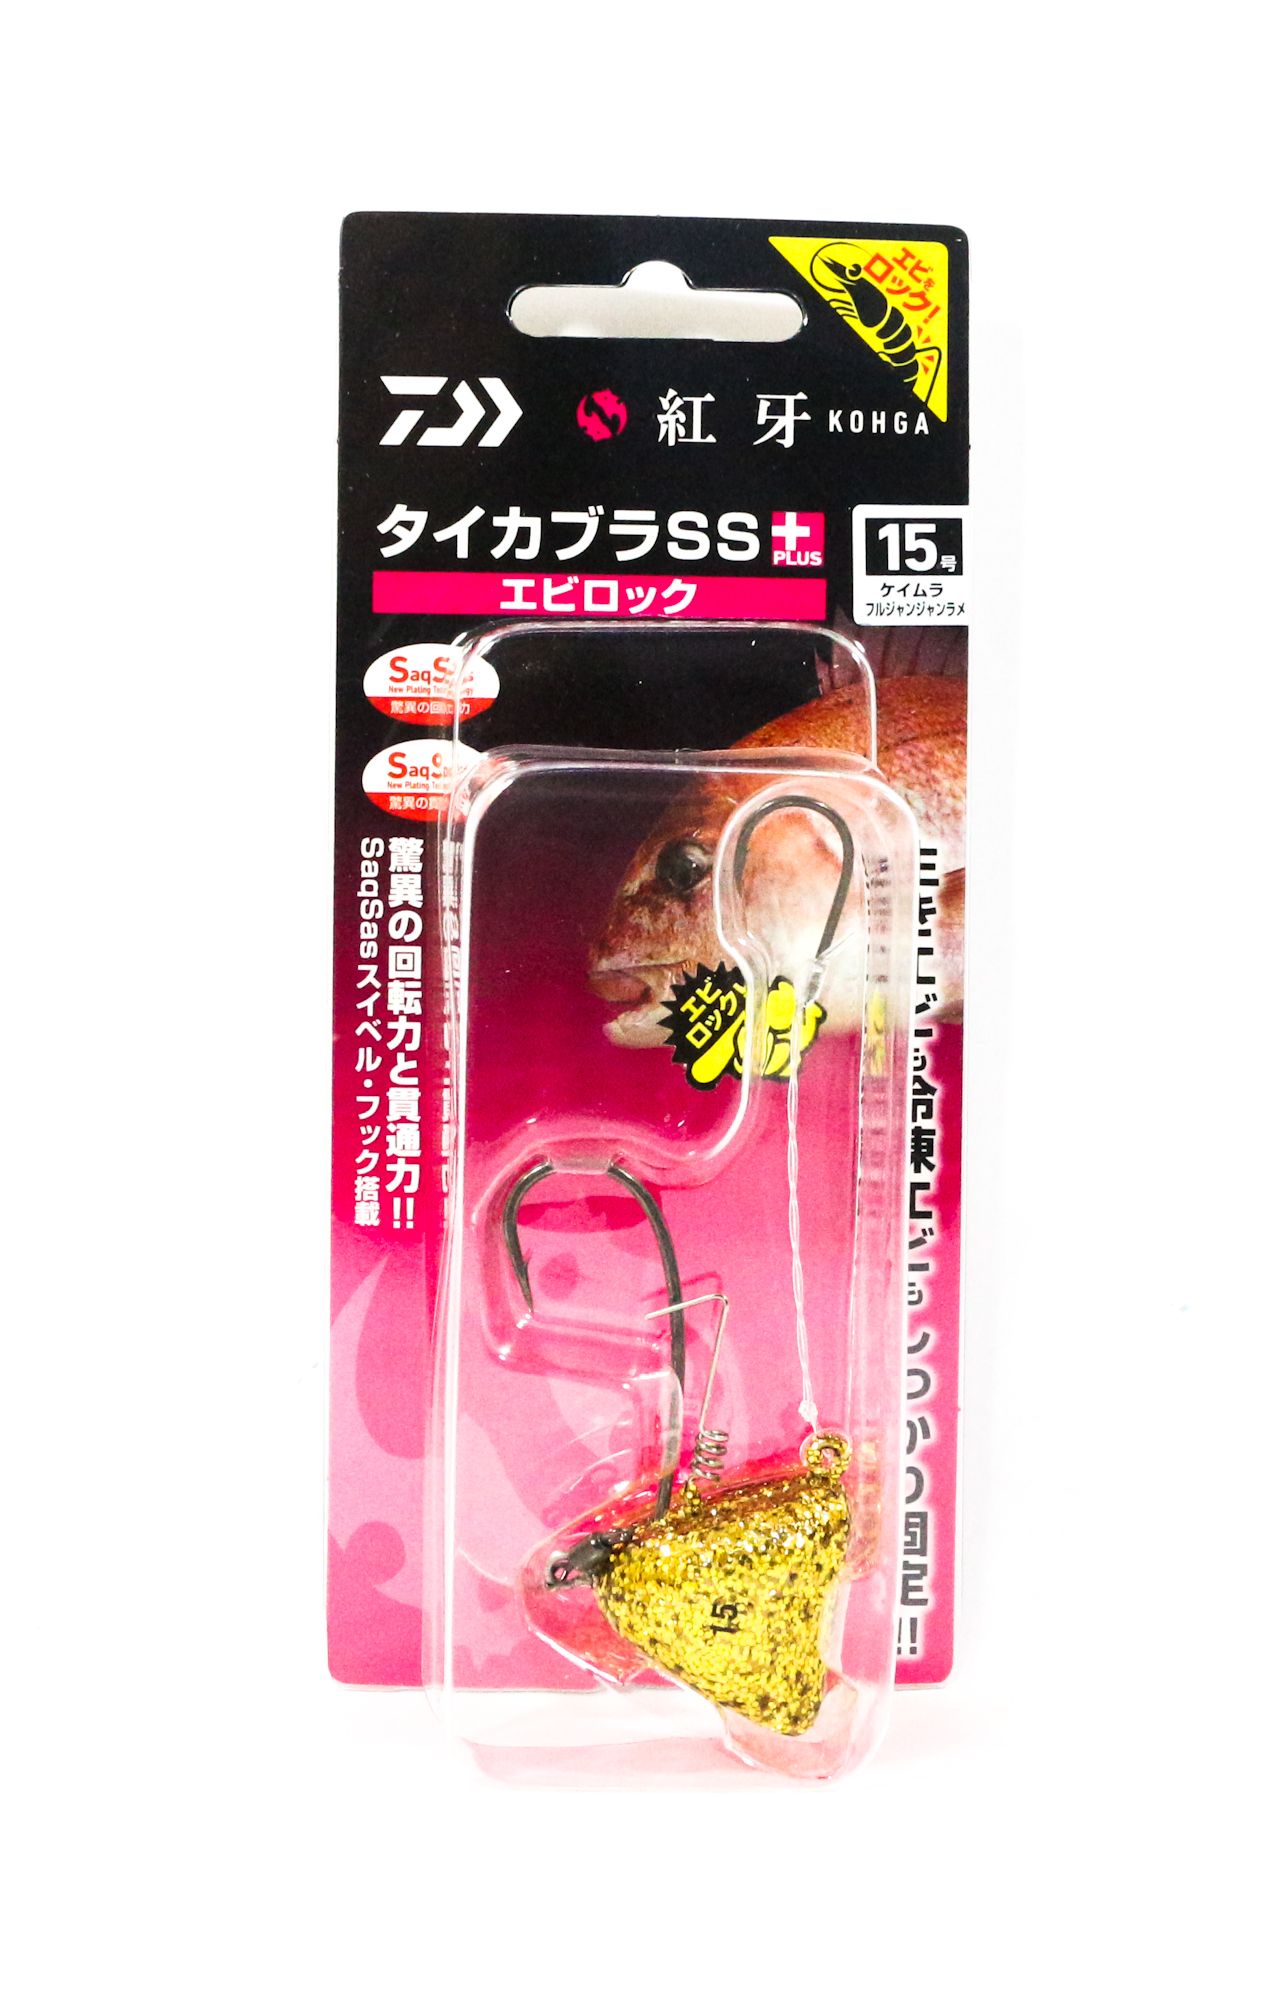 Daiwa Kabura SS+ Tenya Jig Size 15 UV GD/F Flake 003295